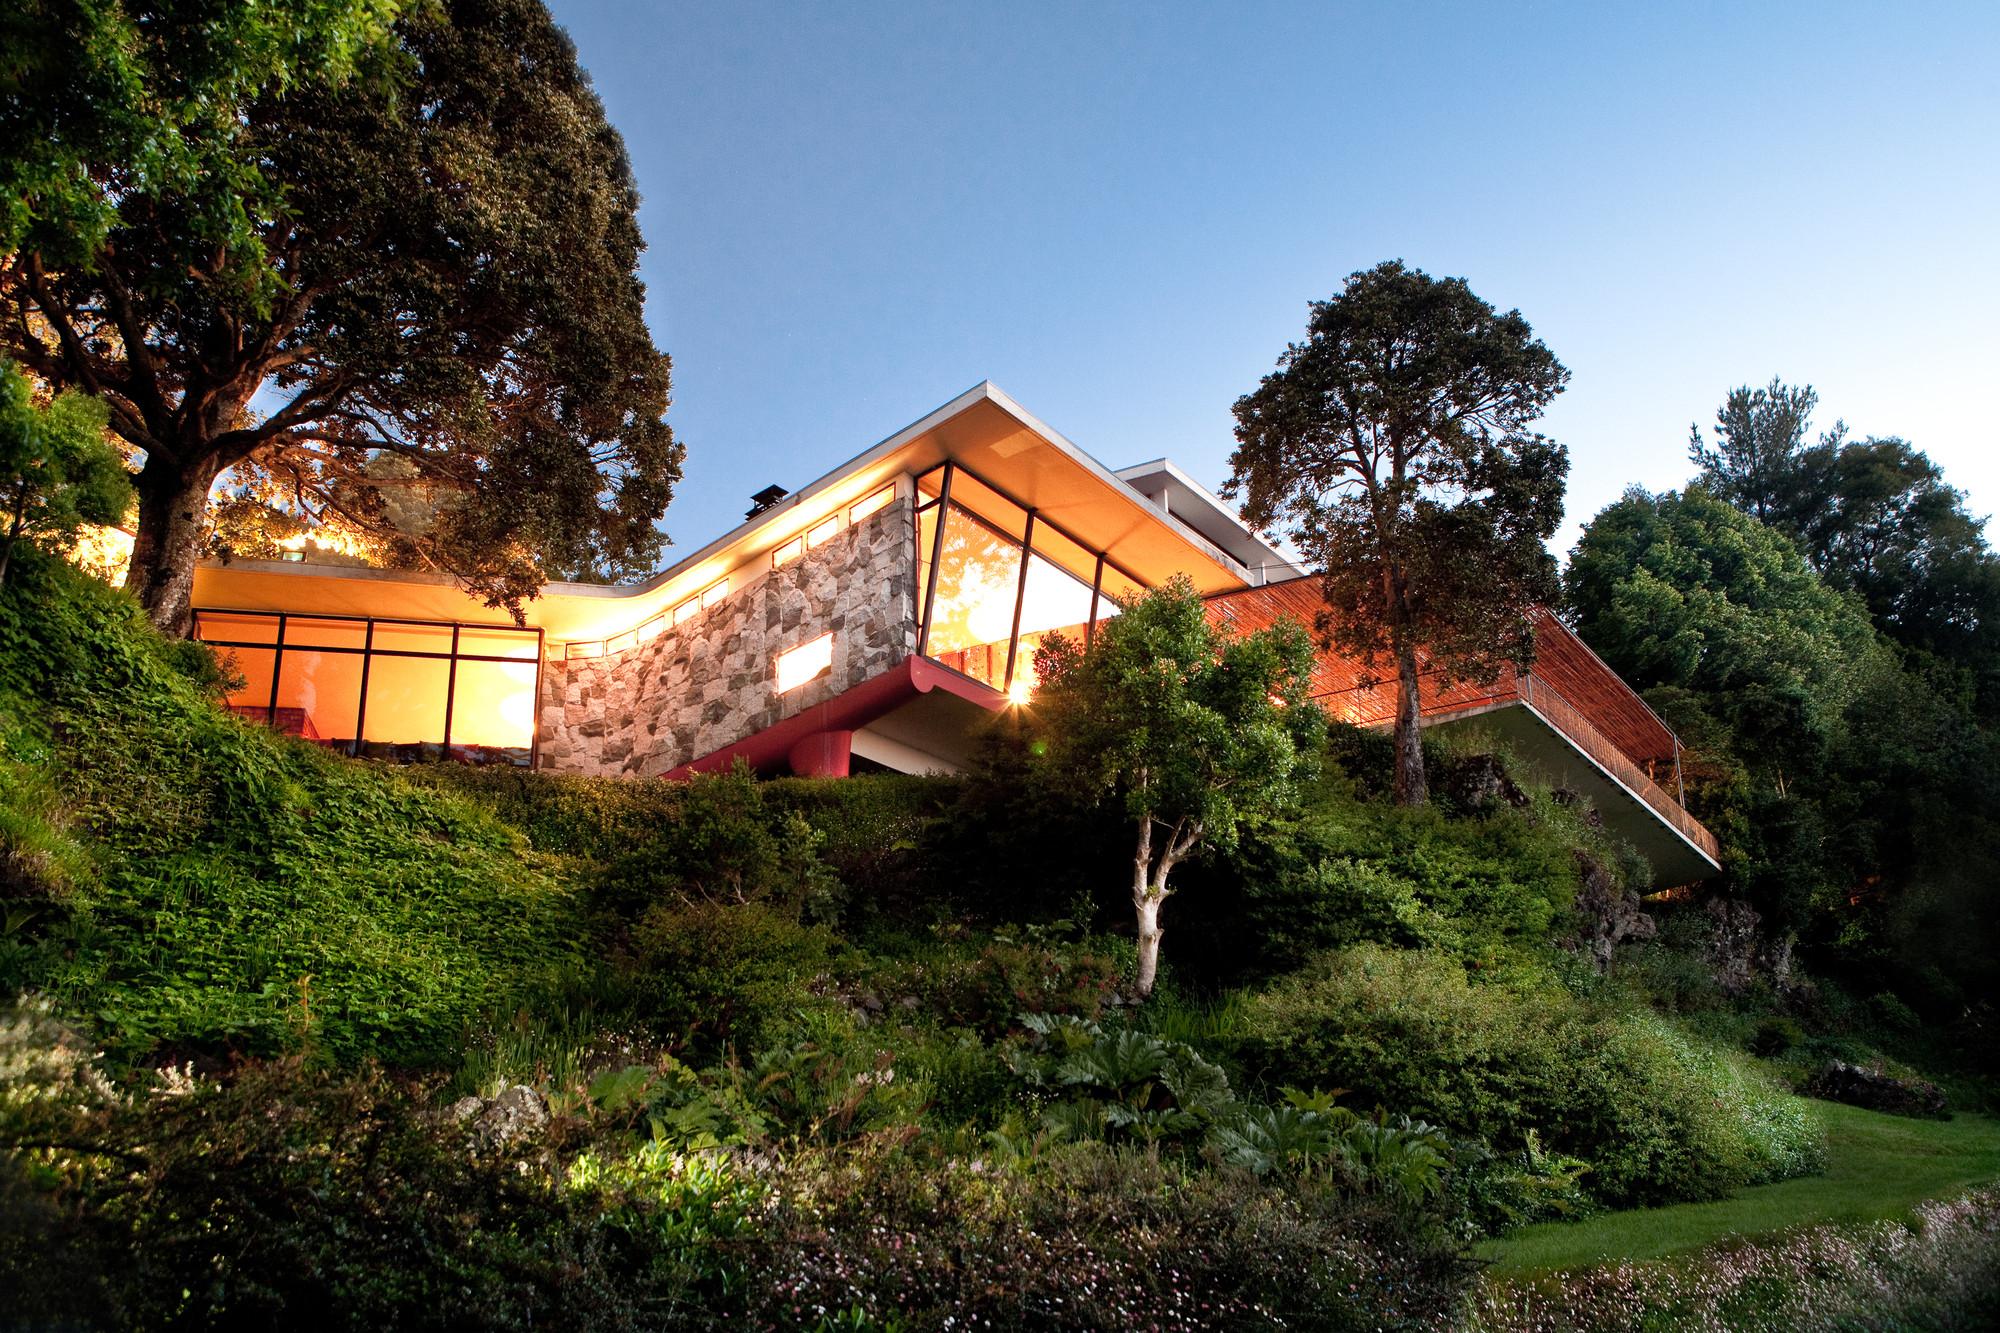 Clásico de Arquitectura: Hotel Antumalal / Jorge Elton, Cortesia de Hotel Antumalal